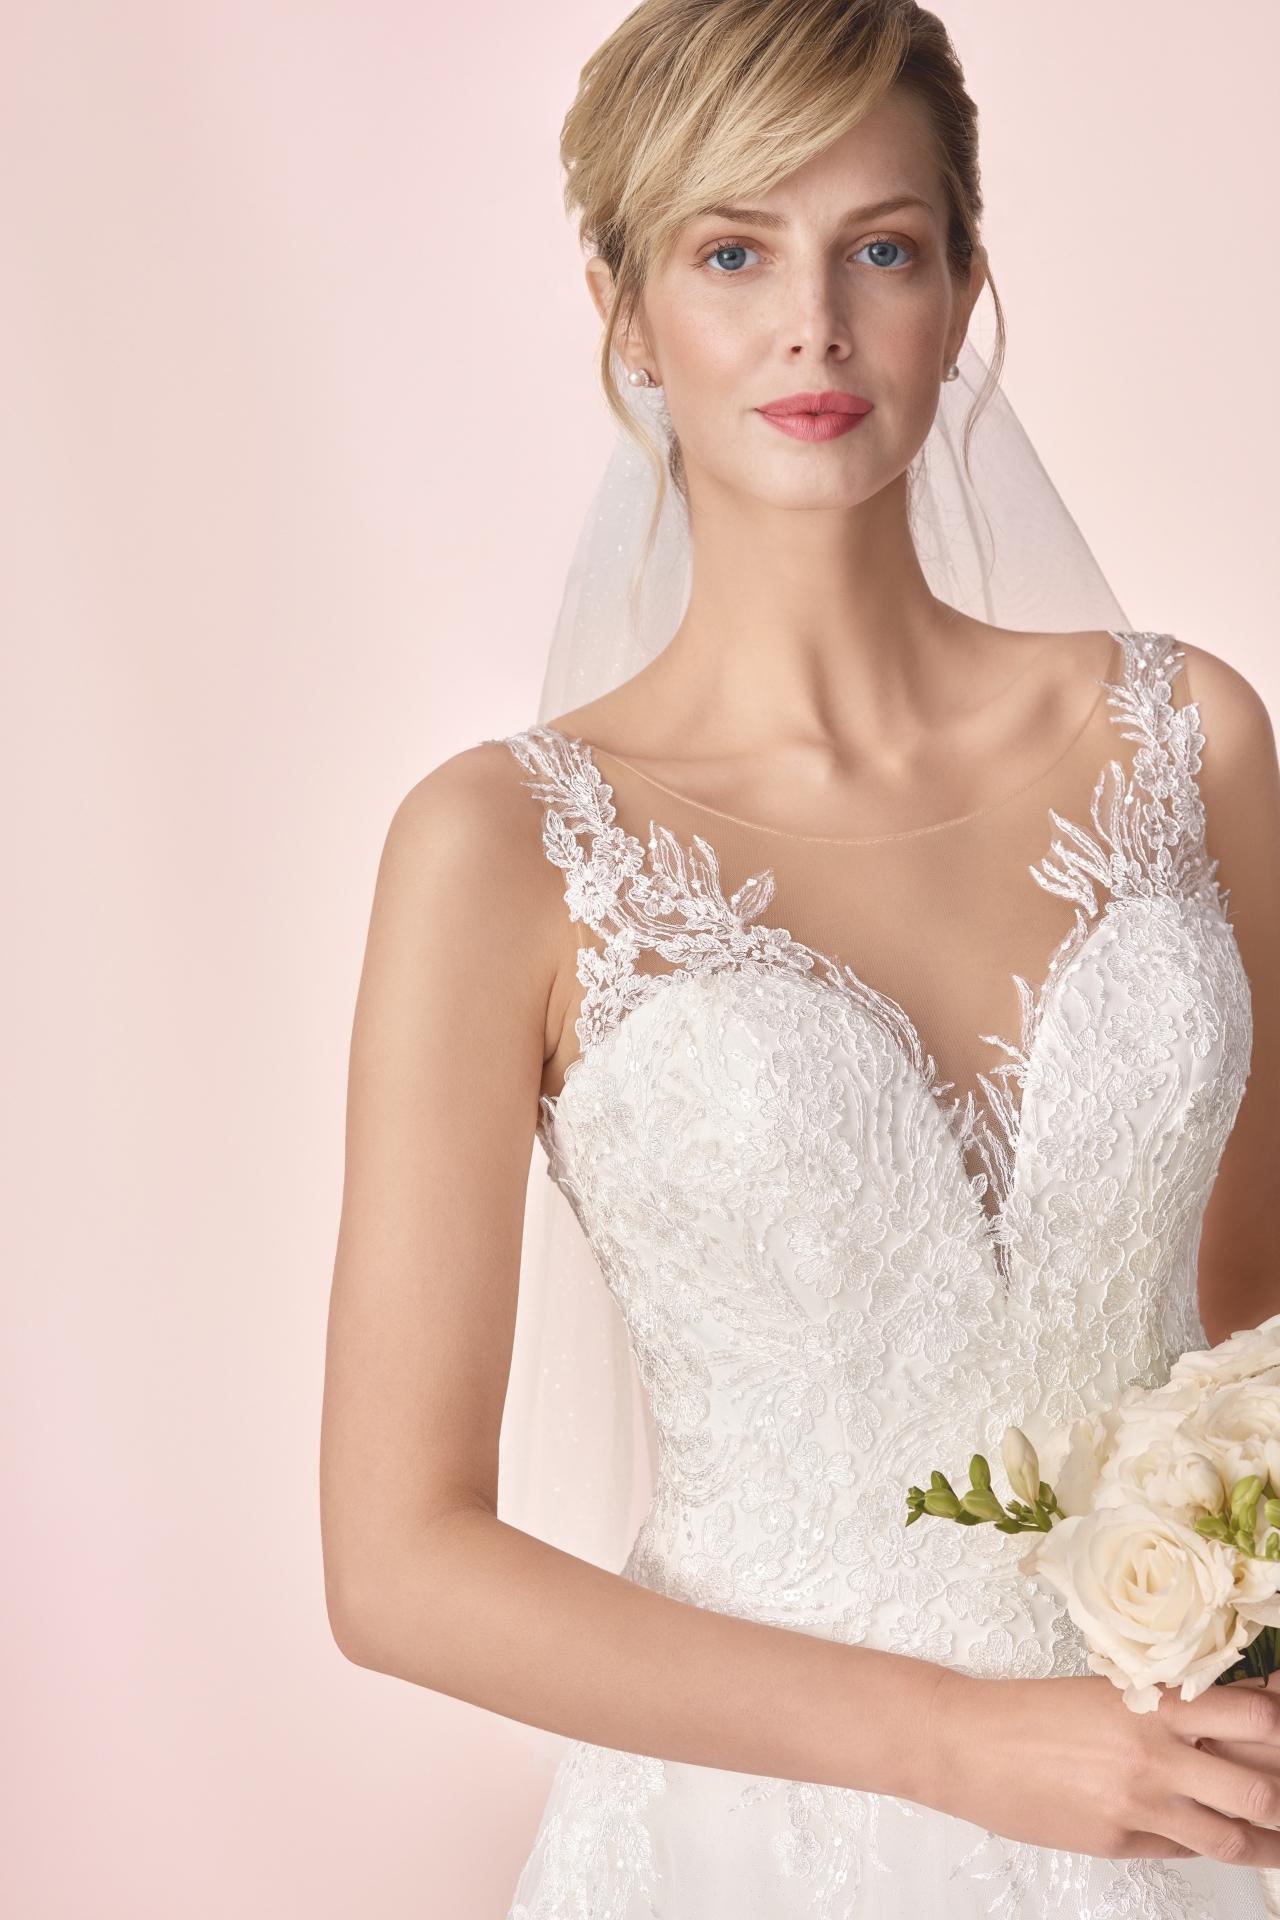 Brautkleid Elizabeth Konin 2019 - 4120T-0